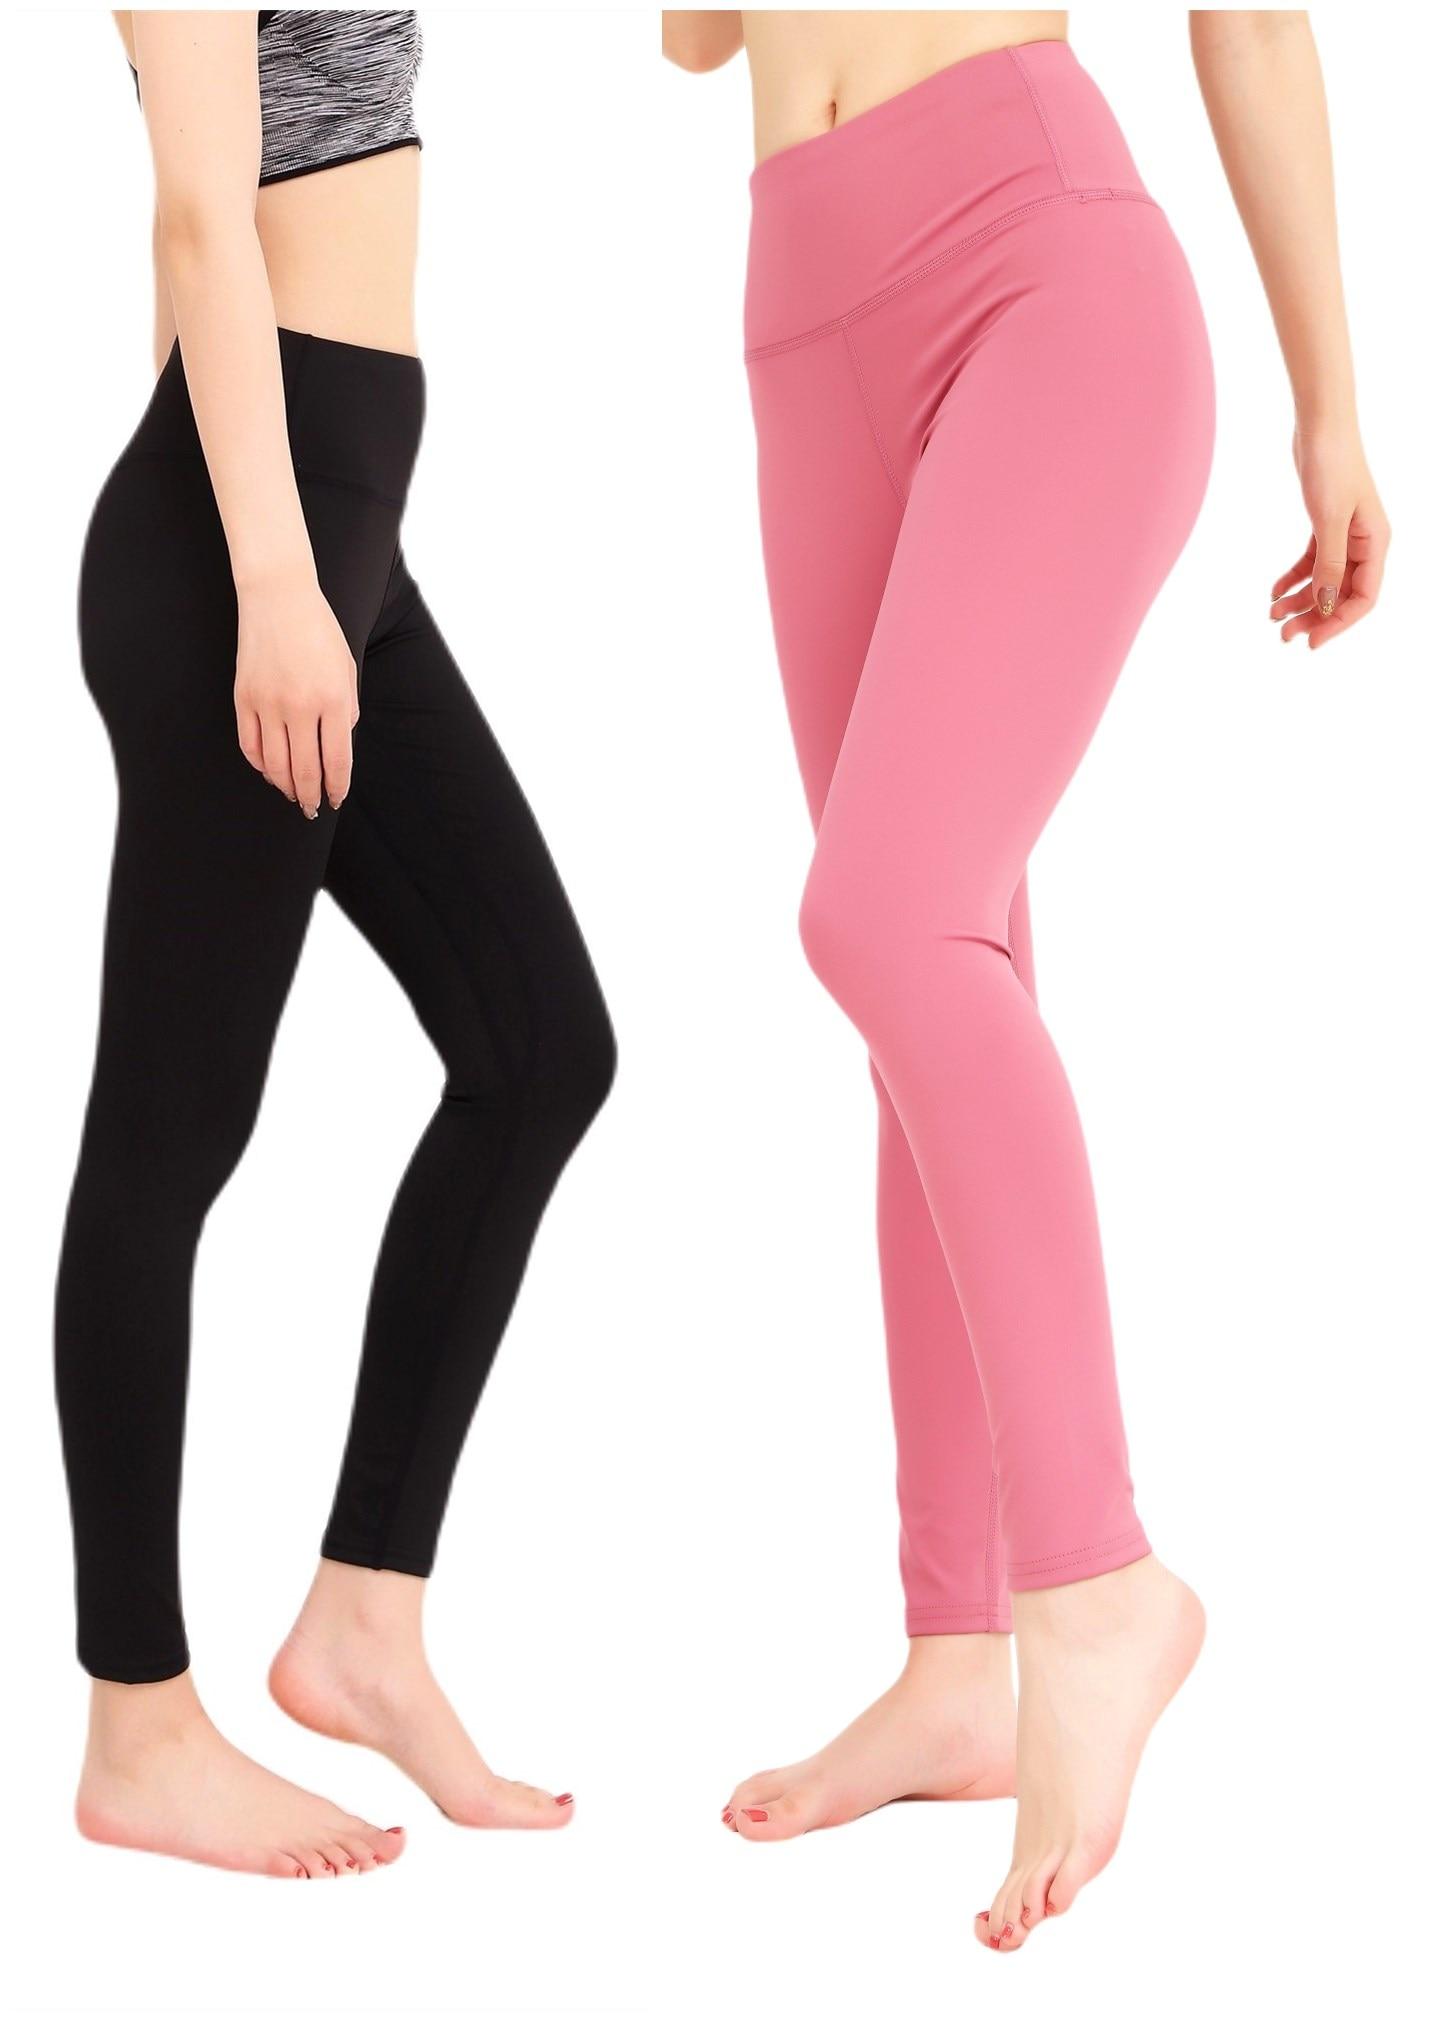 2 PCS/Set Women High Waist Yoga Pants Tummy Control Sport Girl Flex Leggings Fitness Running Tights